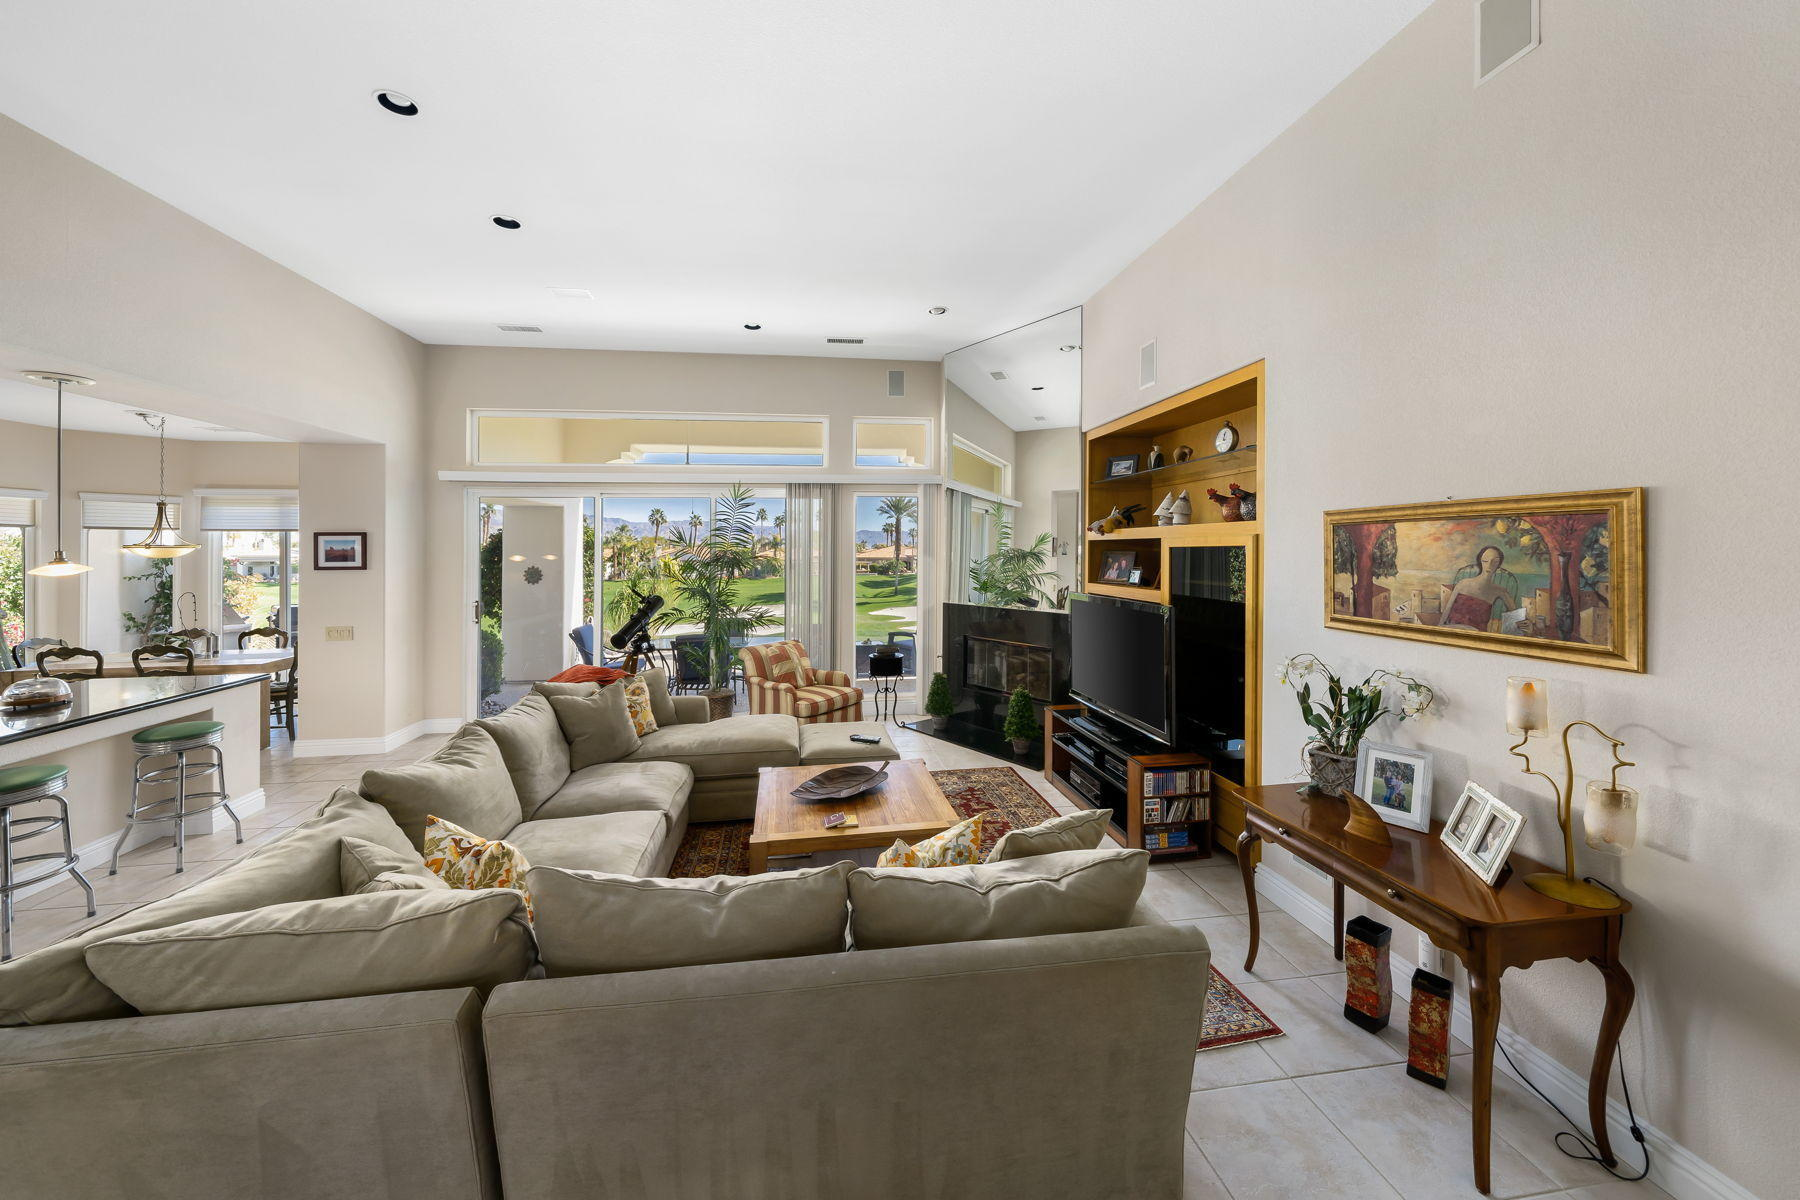 752 Mesa Grande Drive, Palm Desert, California 92211, 3 Bedrooms Bedrooms, ,4 BathroomsBathrooms,Residential,For Sale,752 Mesa Grande Drive,219041501